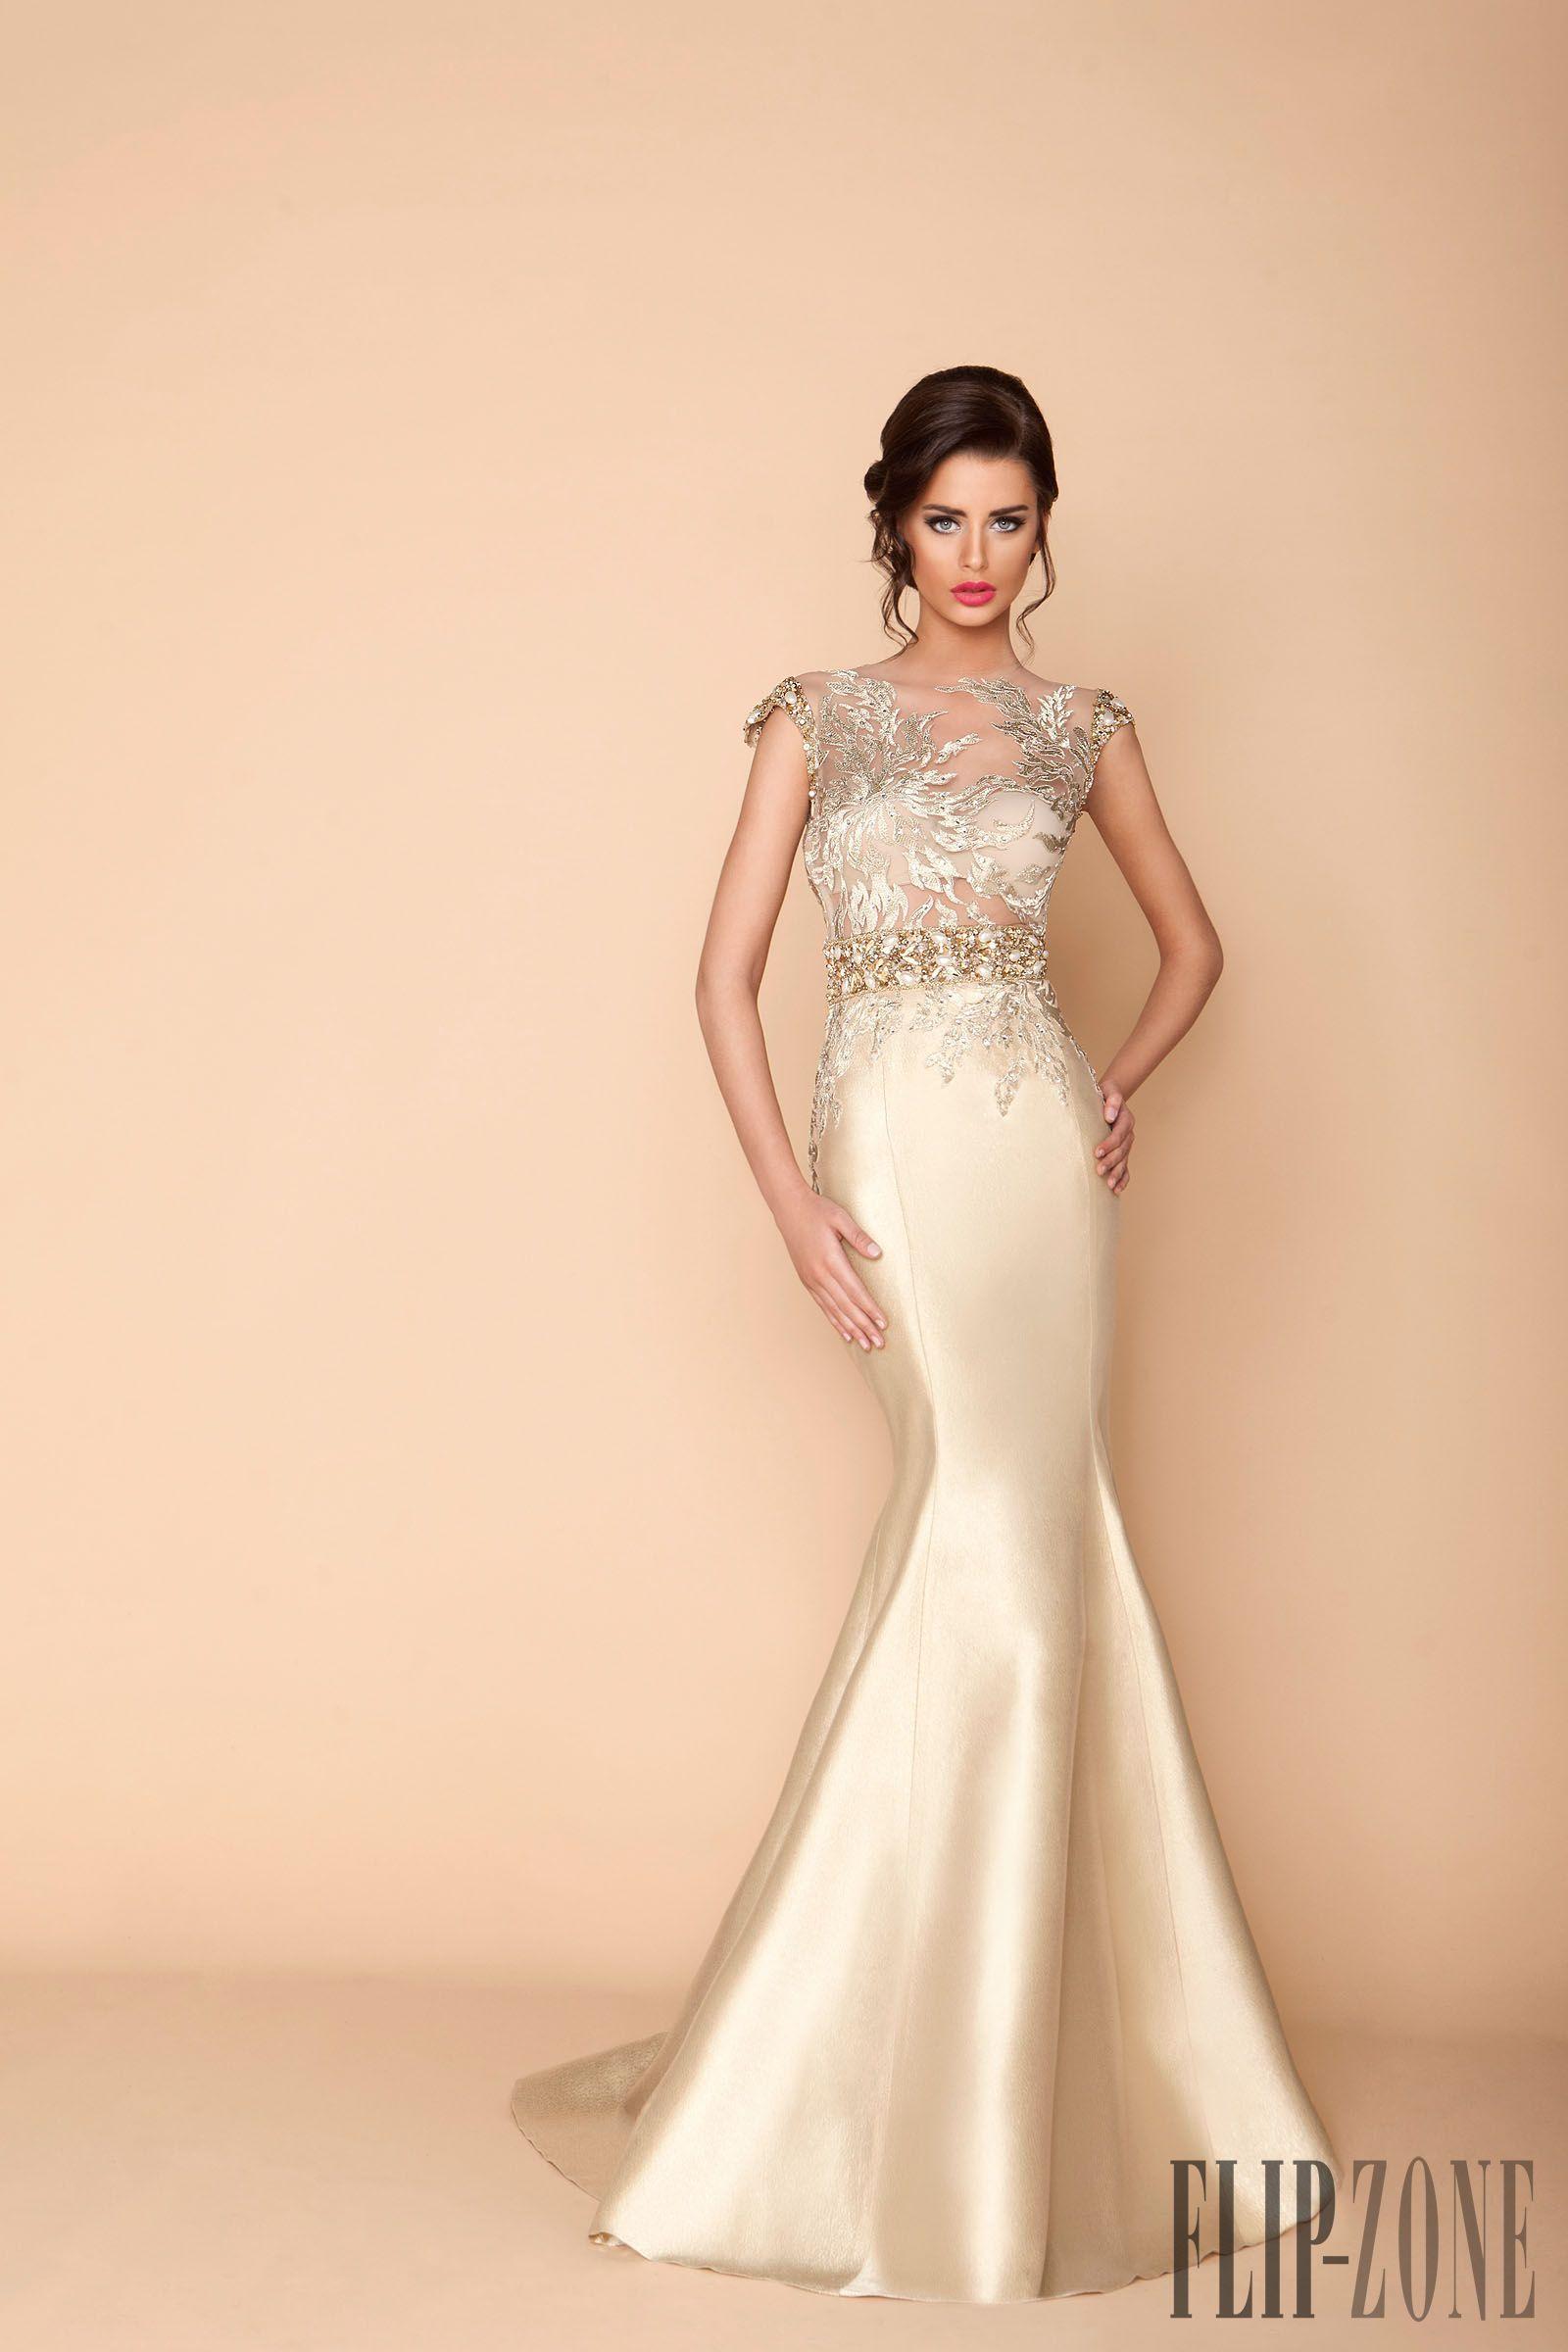 404 Not Found Satin Bridesmaid Dresses Evening Dresses Long Evening Dress 2015